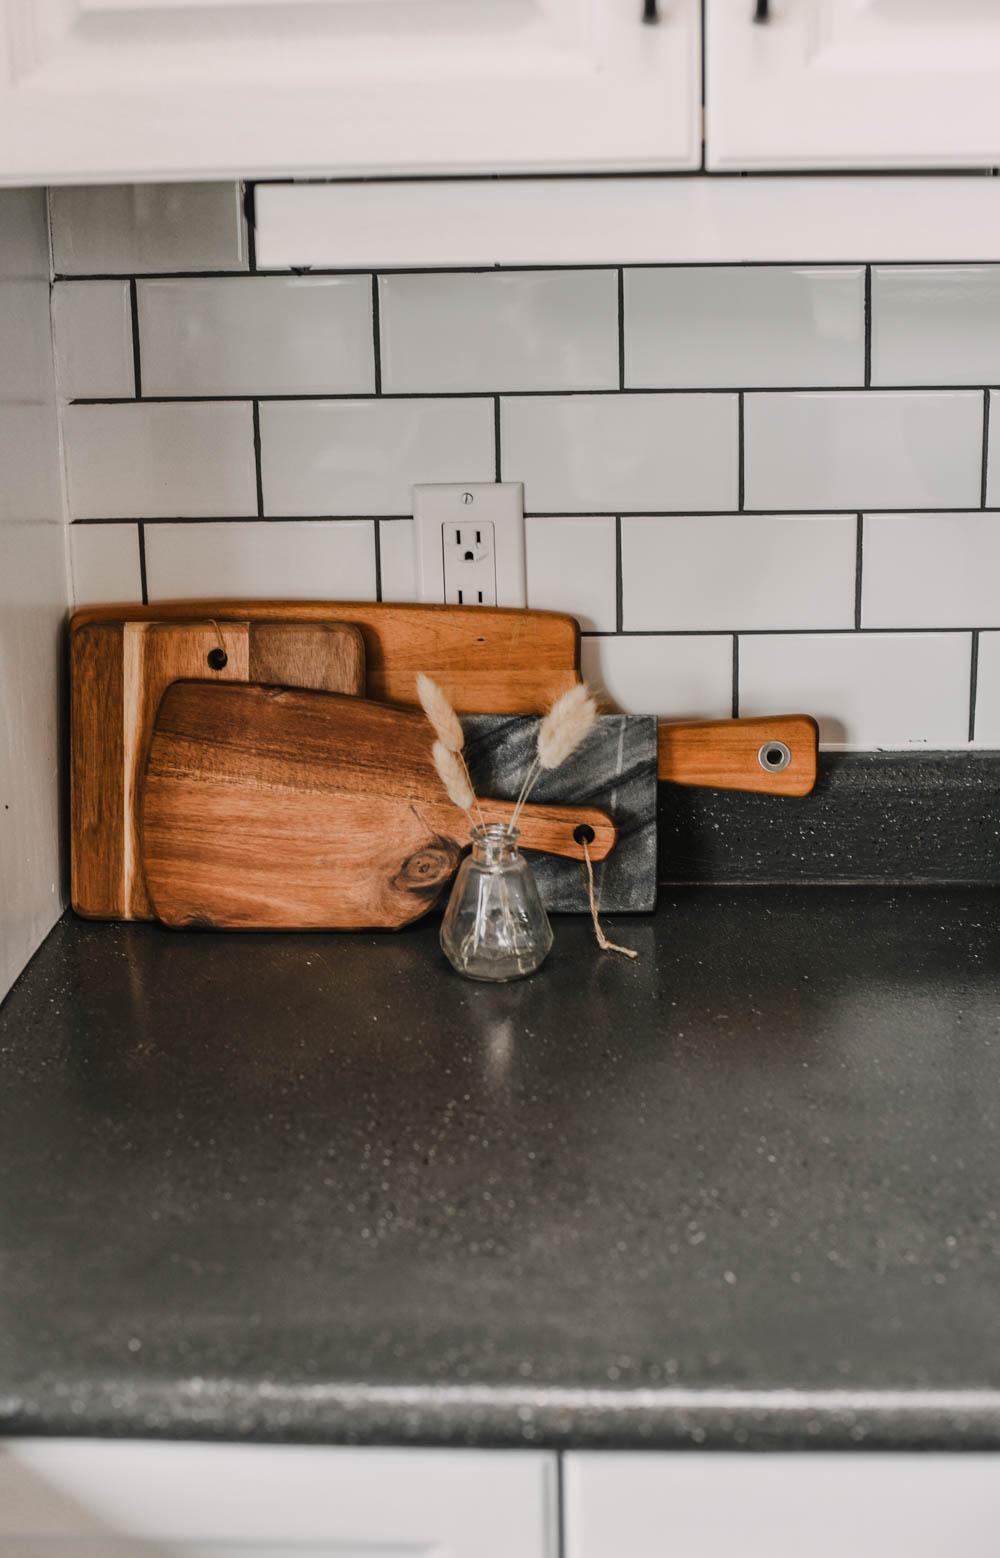 Kitchen Styling from Dollarama